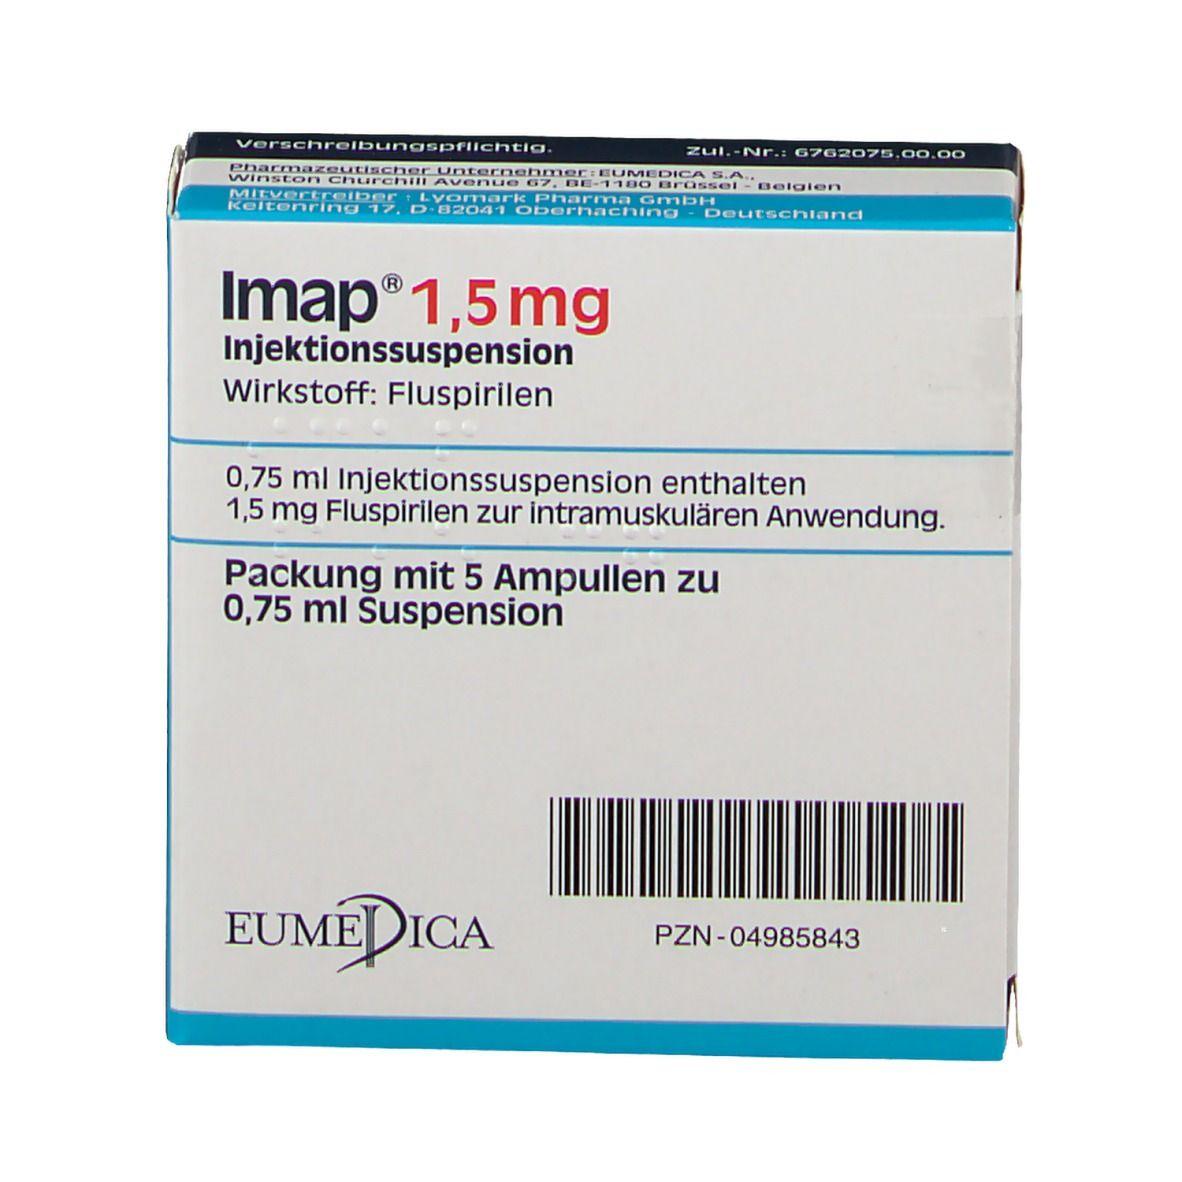 Imap spritze nebenwirkungen